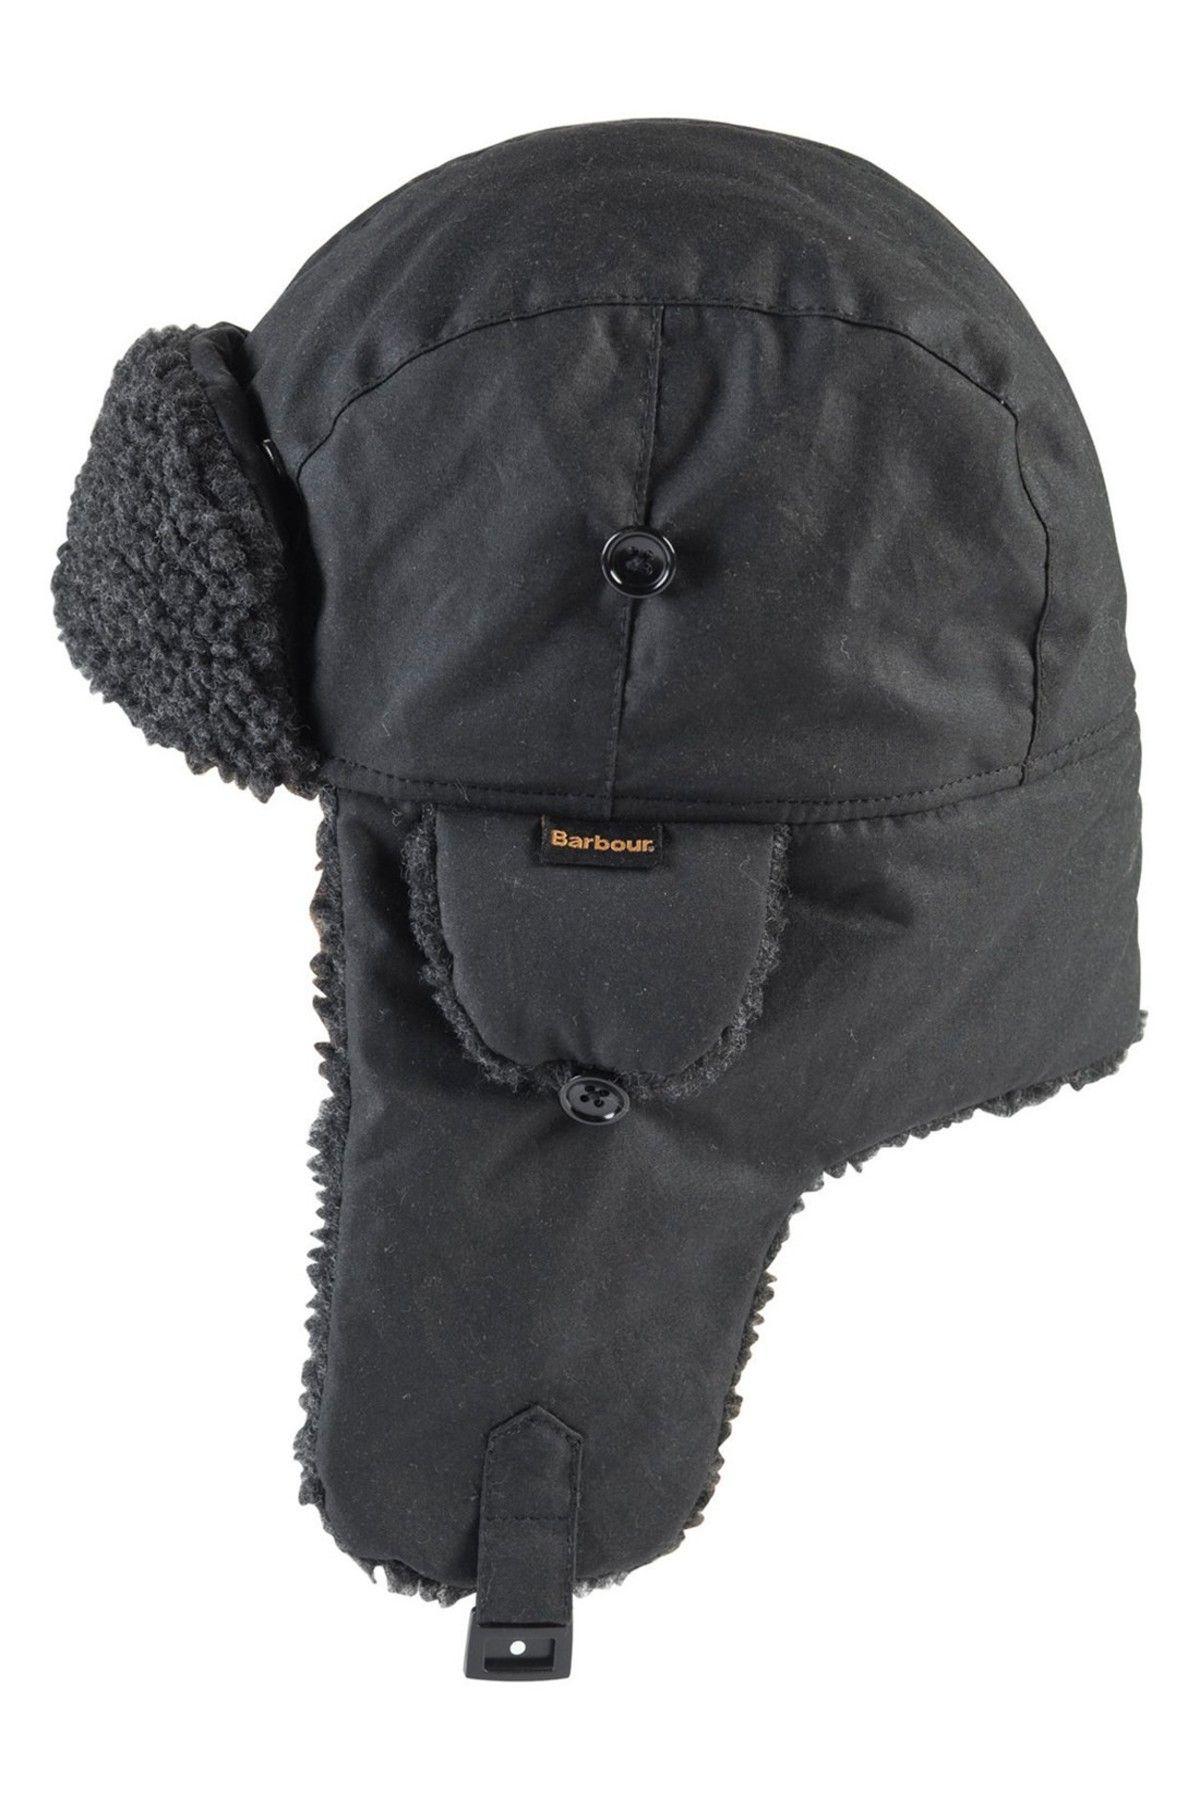 8008e00f11c Fleece Lined Trapper Hat. Fleece Lined Trapper Hat Barbour Mens ...